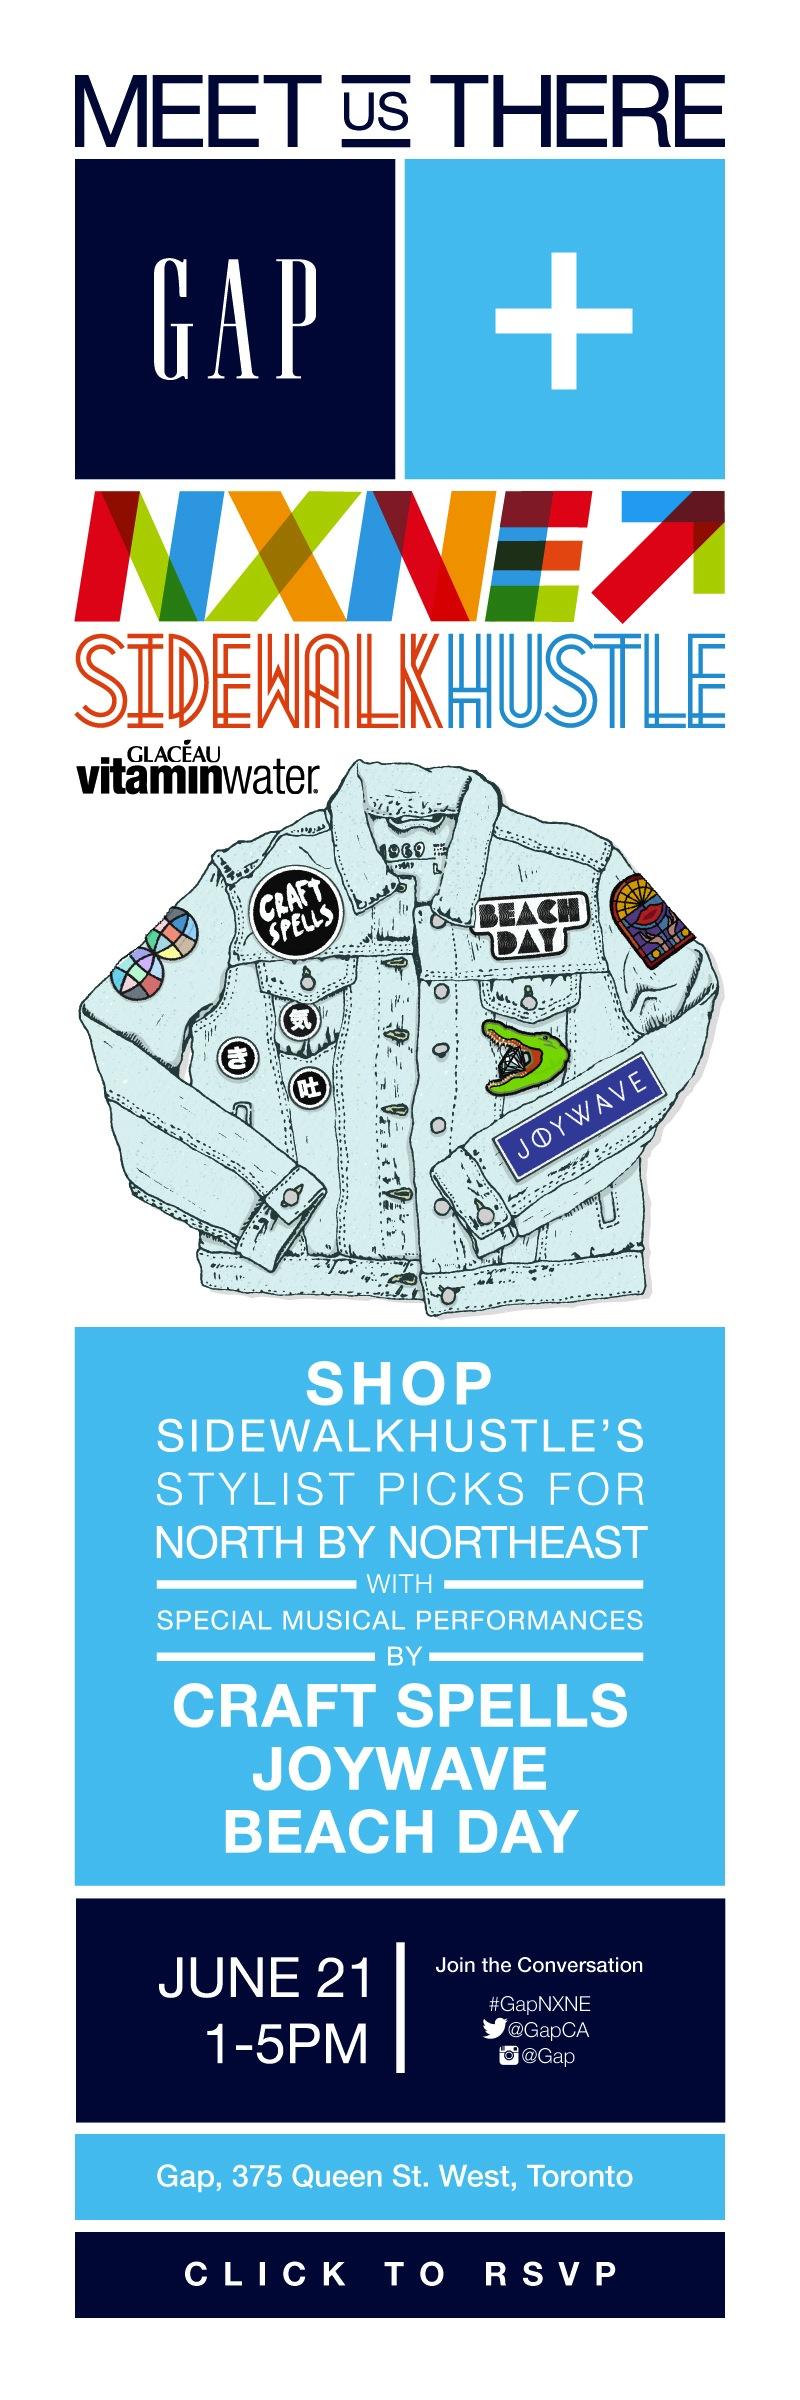 GAP x NXNE X Sidewalk Hustle Show June 21st long